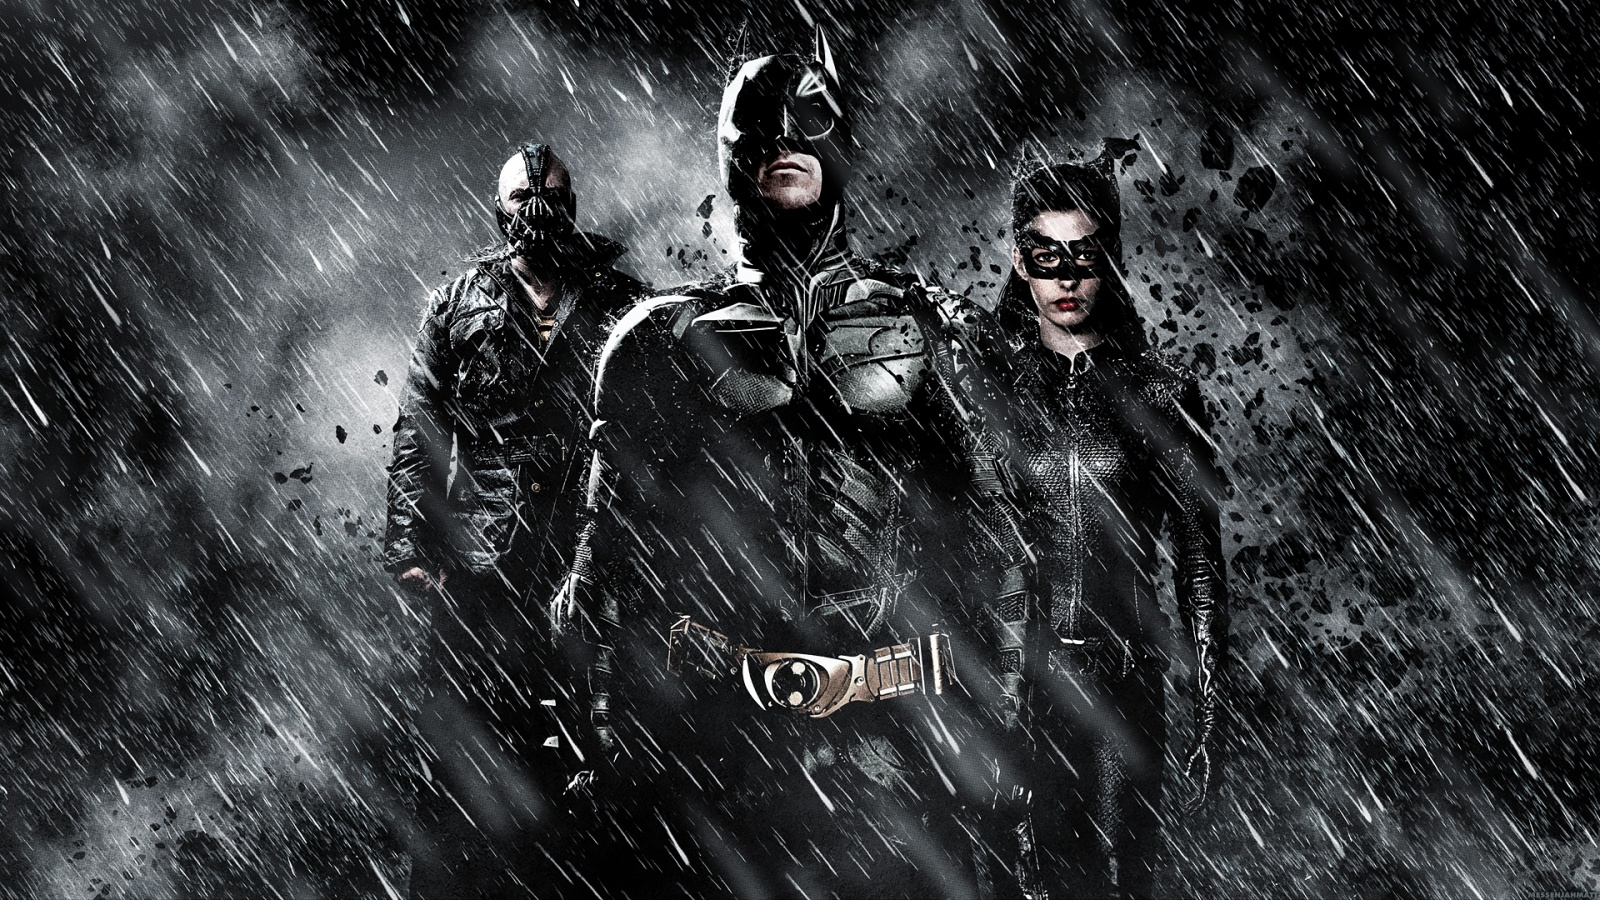 http://1.bp.blogspot.com/-o3p8ck_G3gs/T8C7UO1FotI/AAAAAAAABvM/viKA7fXFzuk/s1600/Bane_Batman_Catwomen_The_Dark_Knight_Rises_HD_Wallpaper-Vvallpaper.Net.jpg